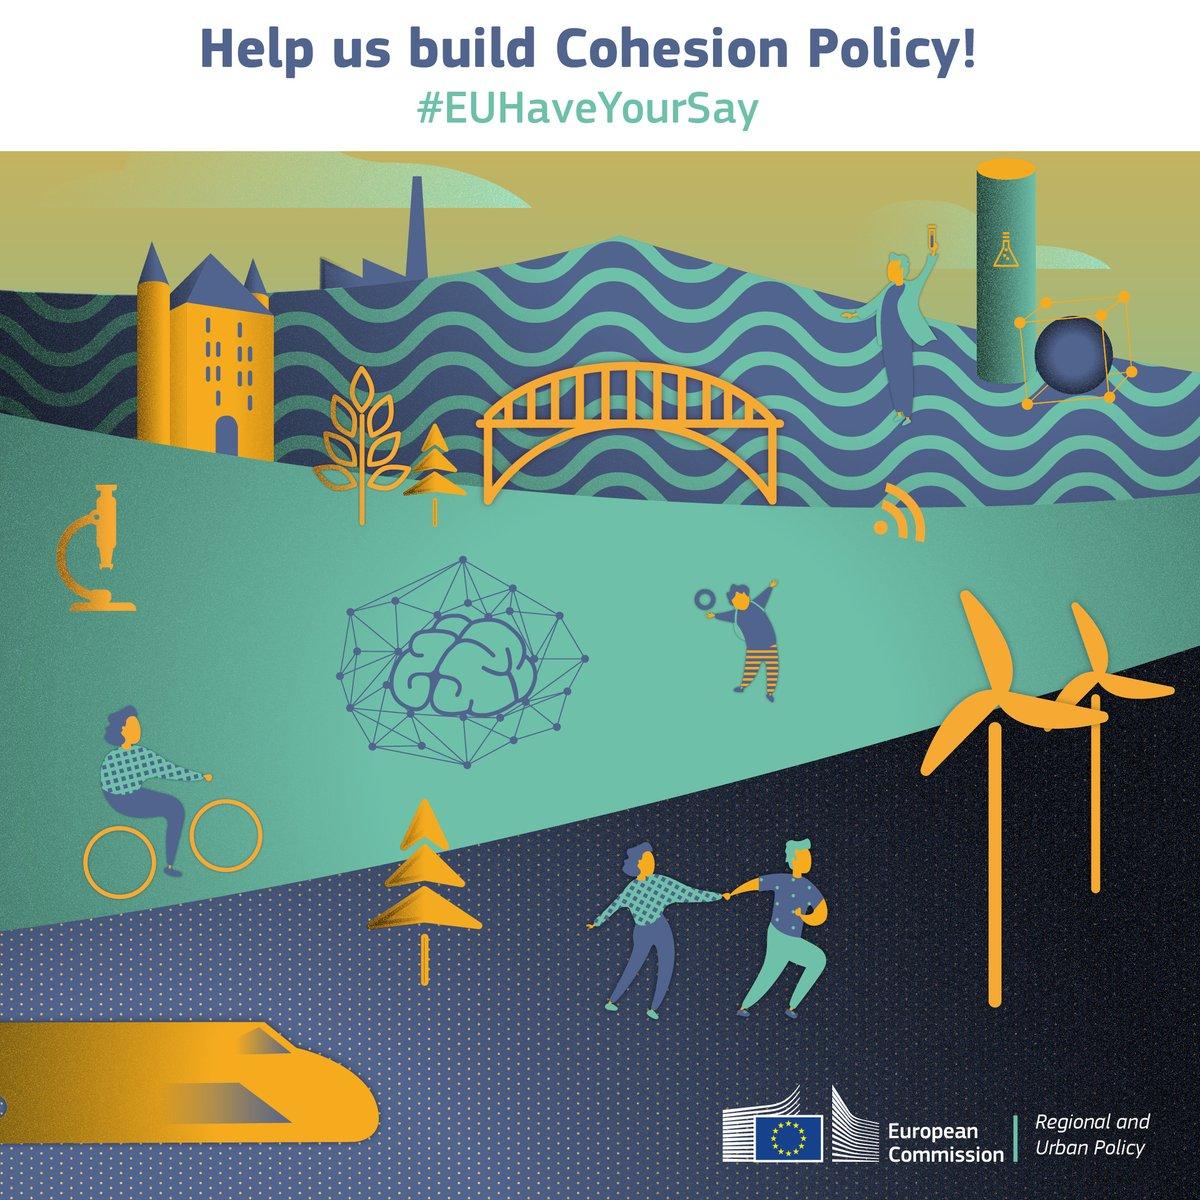 EC public consultations post 2020 Cohesion Policy - SA response